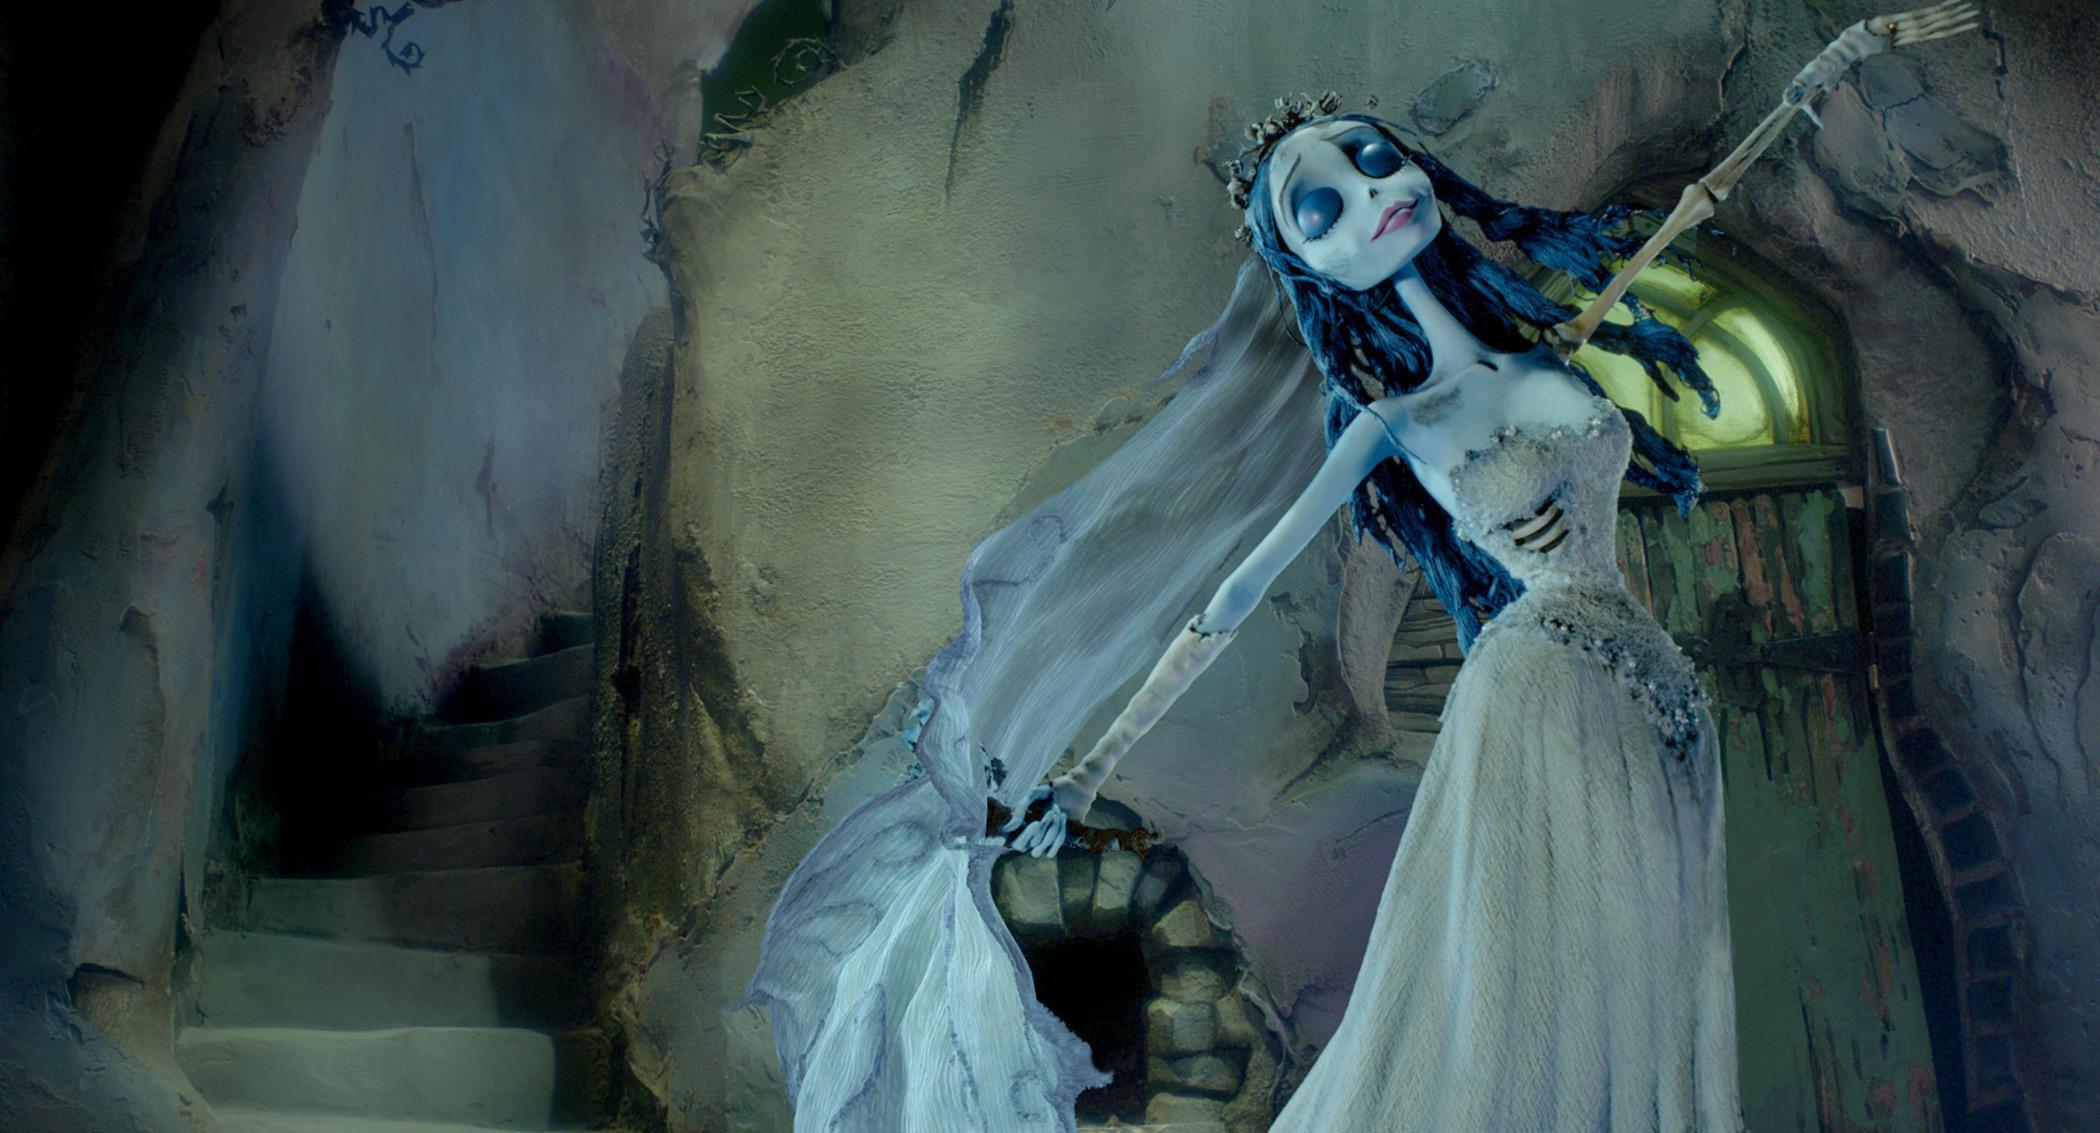 Emily the corpse bride emily